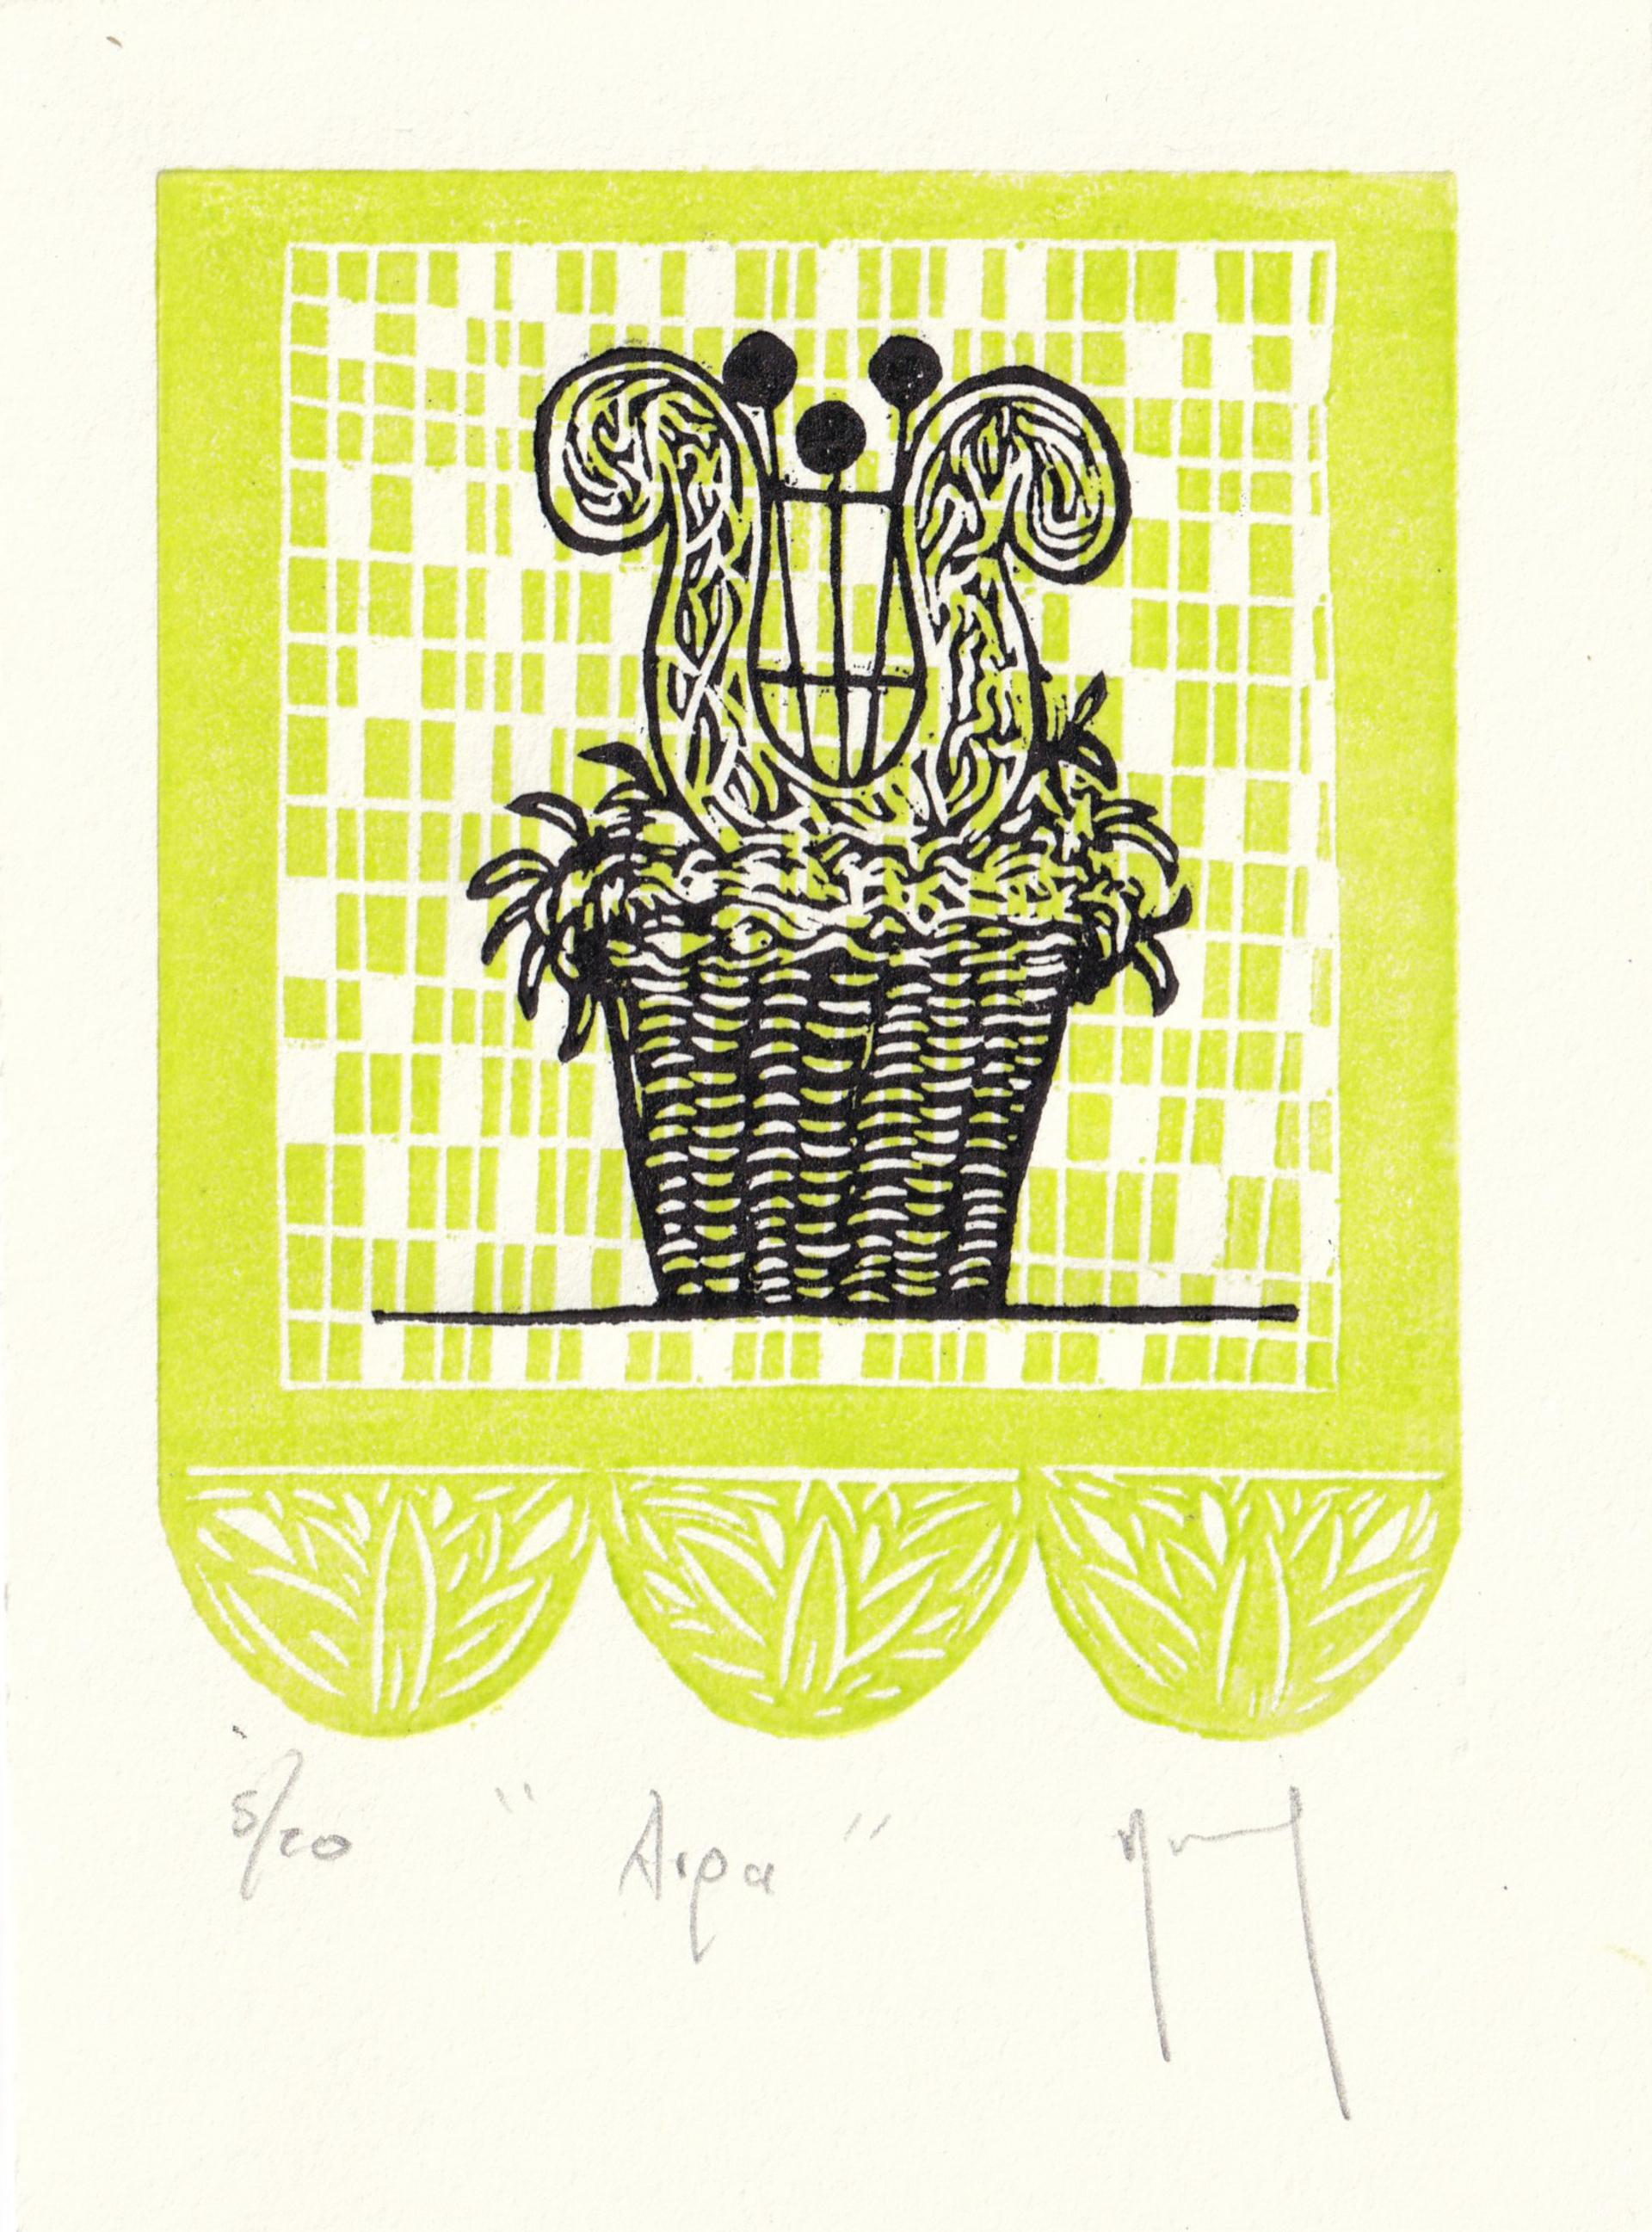 Serie Oaxaca (Arpa) by Miguel Jimenez Martinez